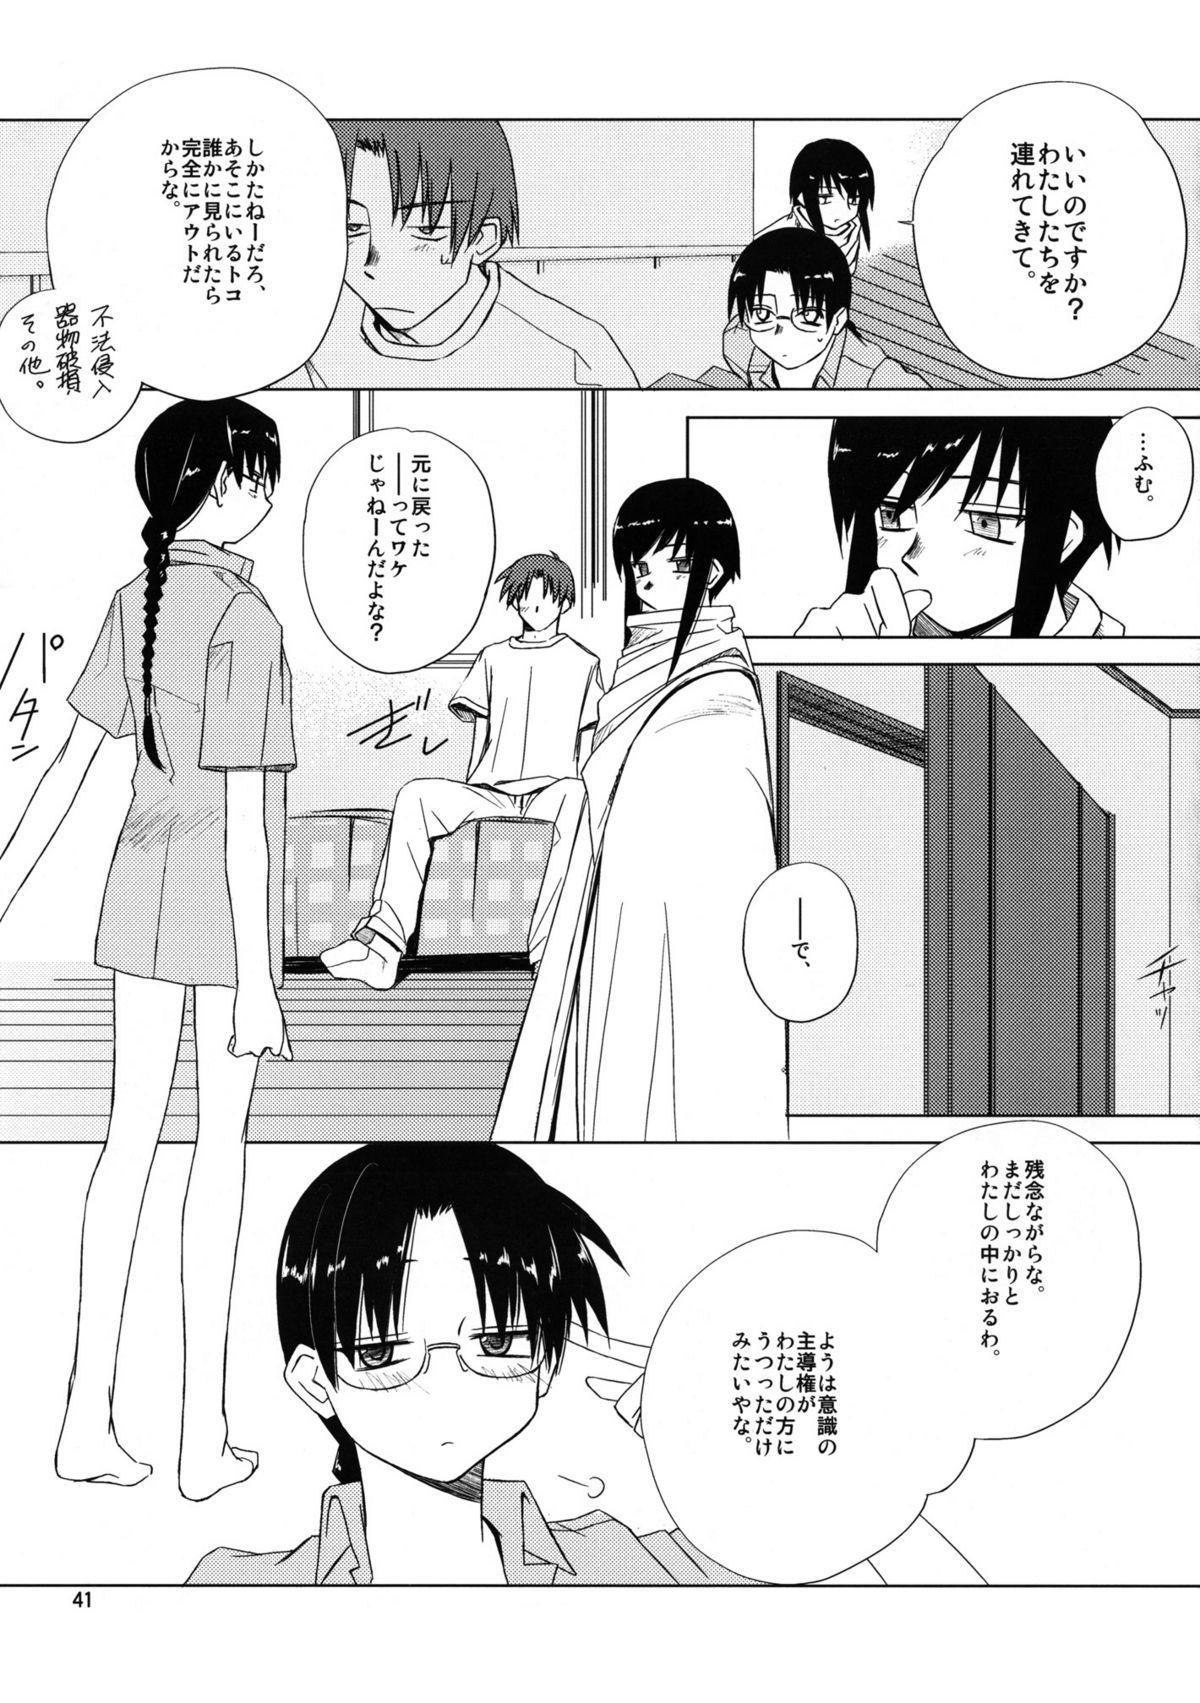 (C68) [Tear Drop (tsuina)] [C2] (To Heart) 41